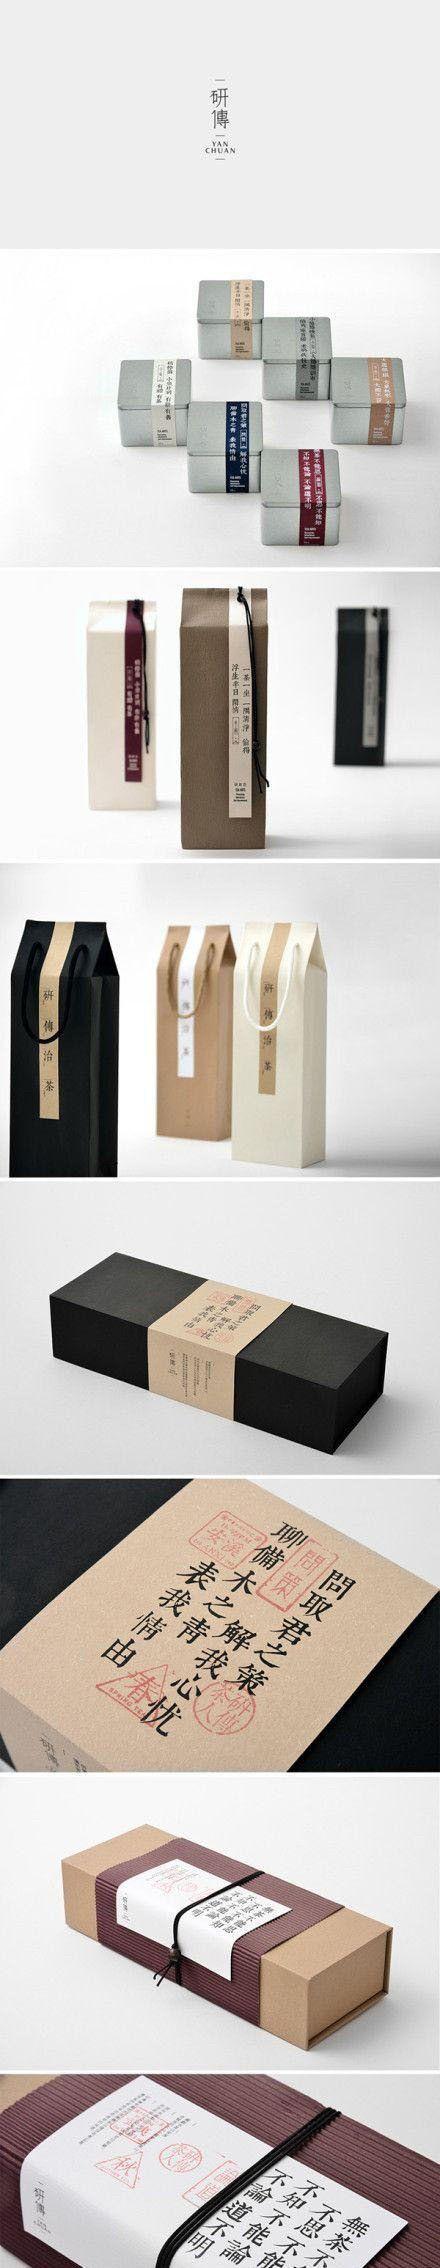 emballage-kraft-bouteille